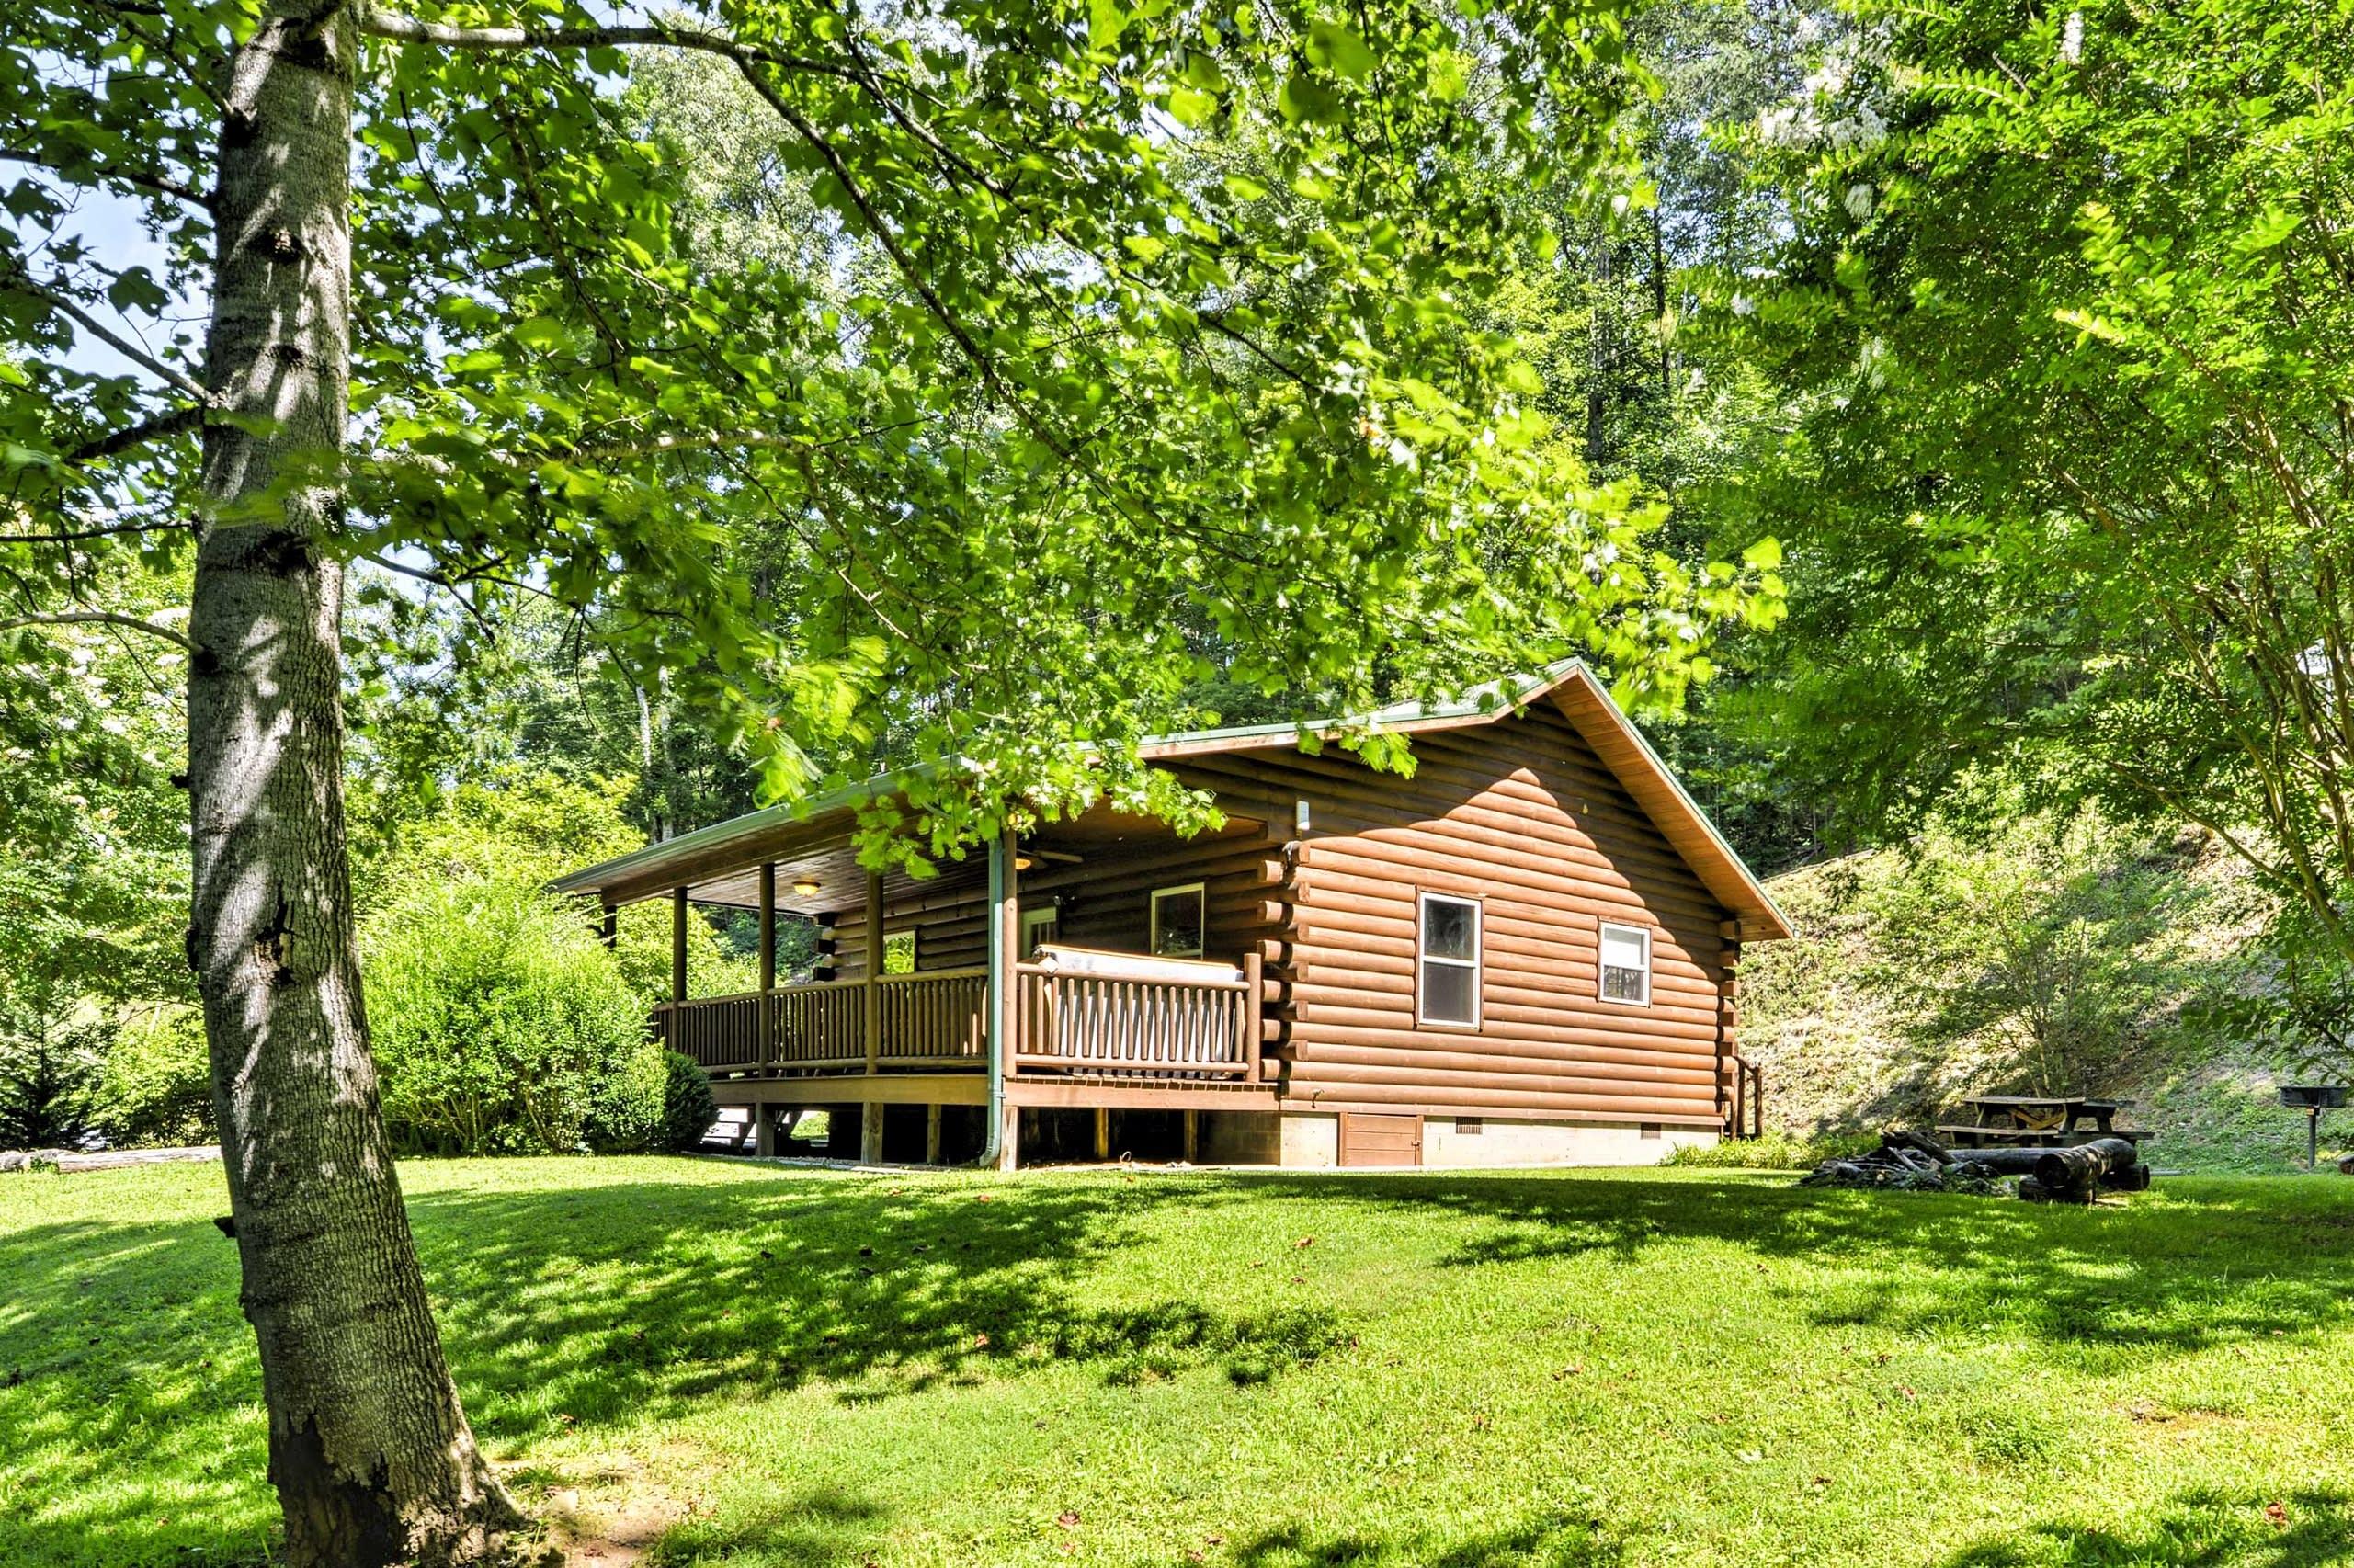 'Fox Creek Meadowside Cabin,' is a charming vacation rental cabin in Bryson City.